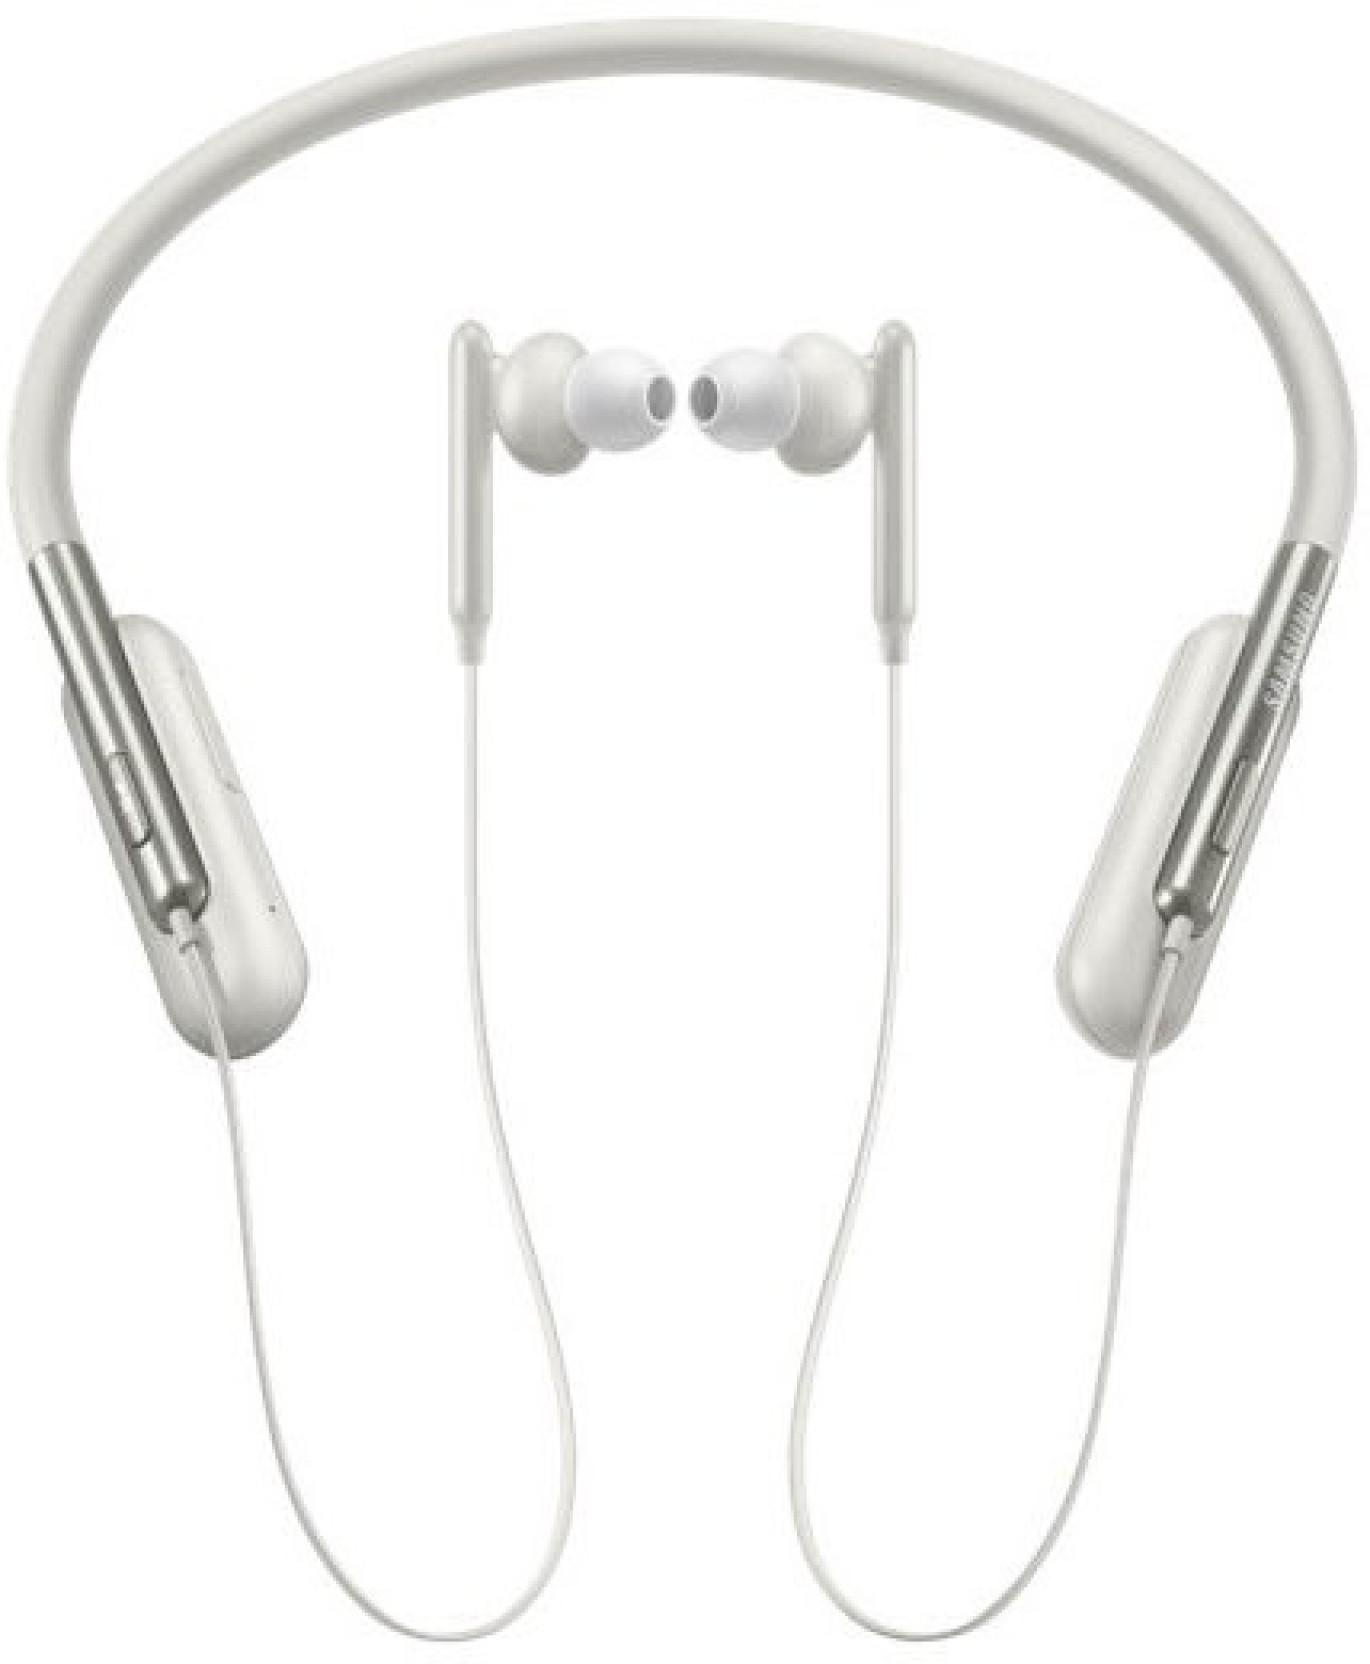 Samsung U Flex Headphones Eo Bg950cwegin Bluetooth Headset With Level Original Add To Cart